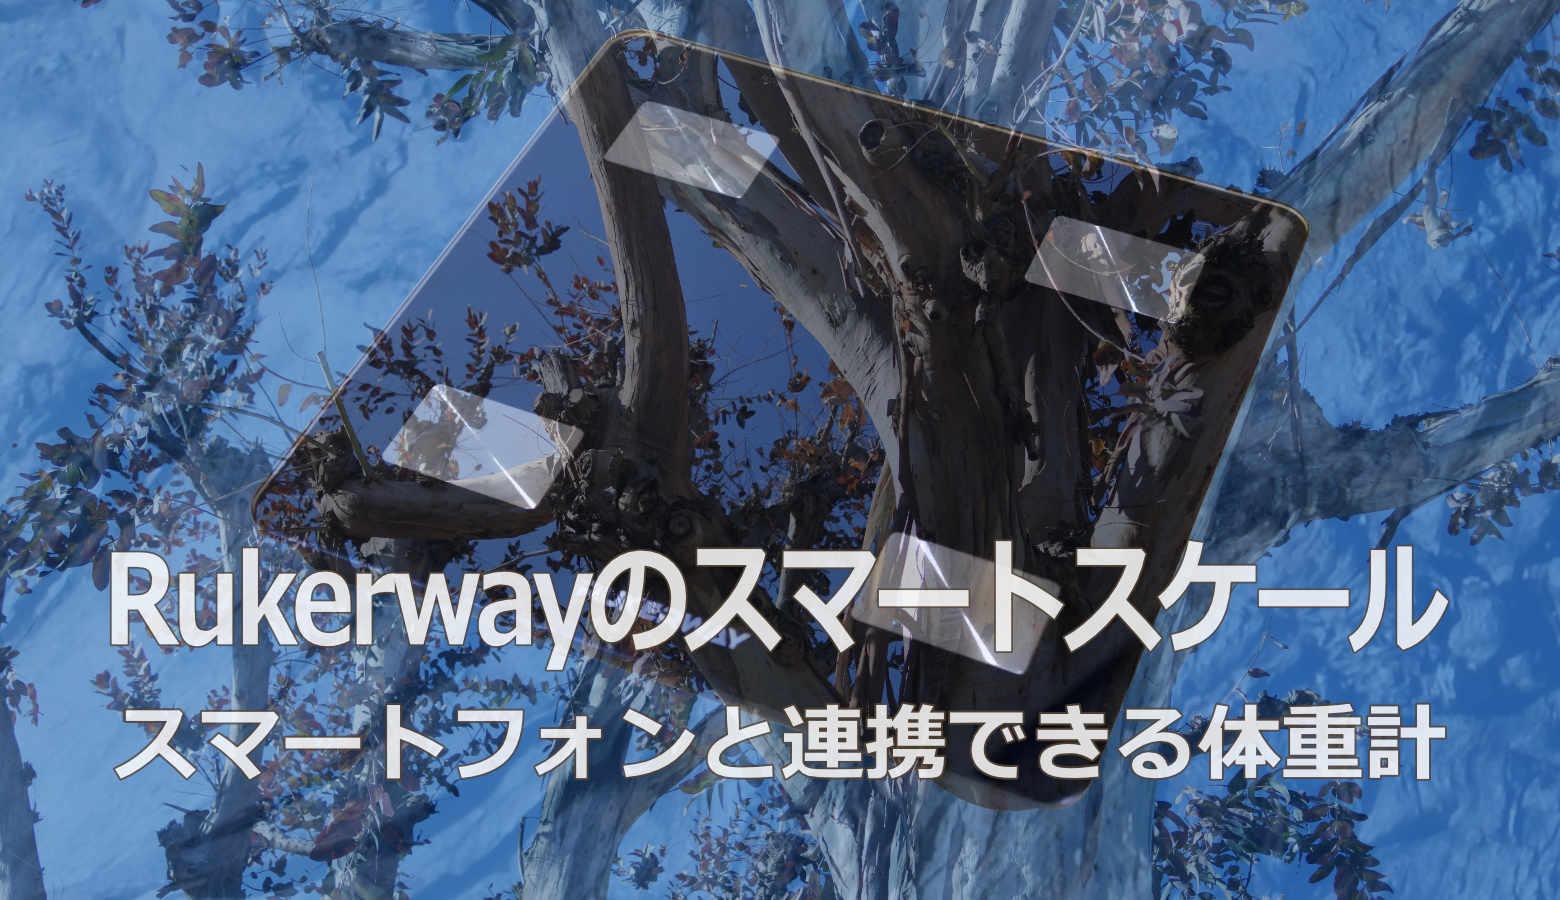 RukerwayのUSB充電式スマートスケール